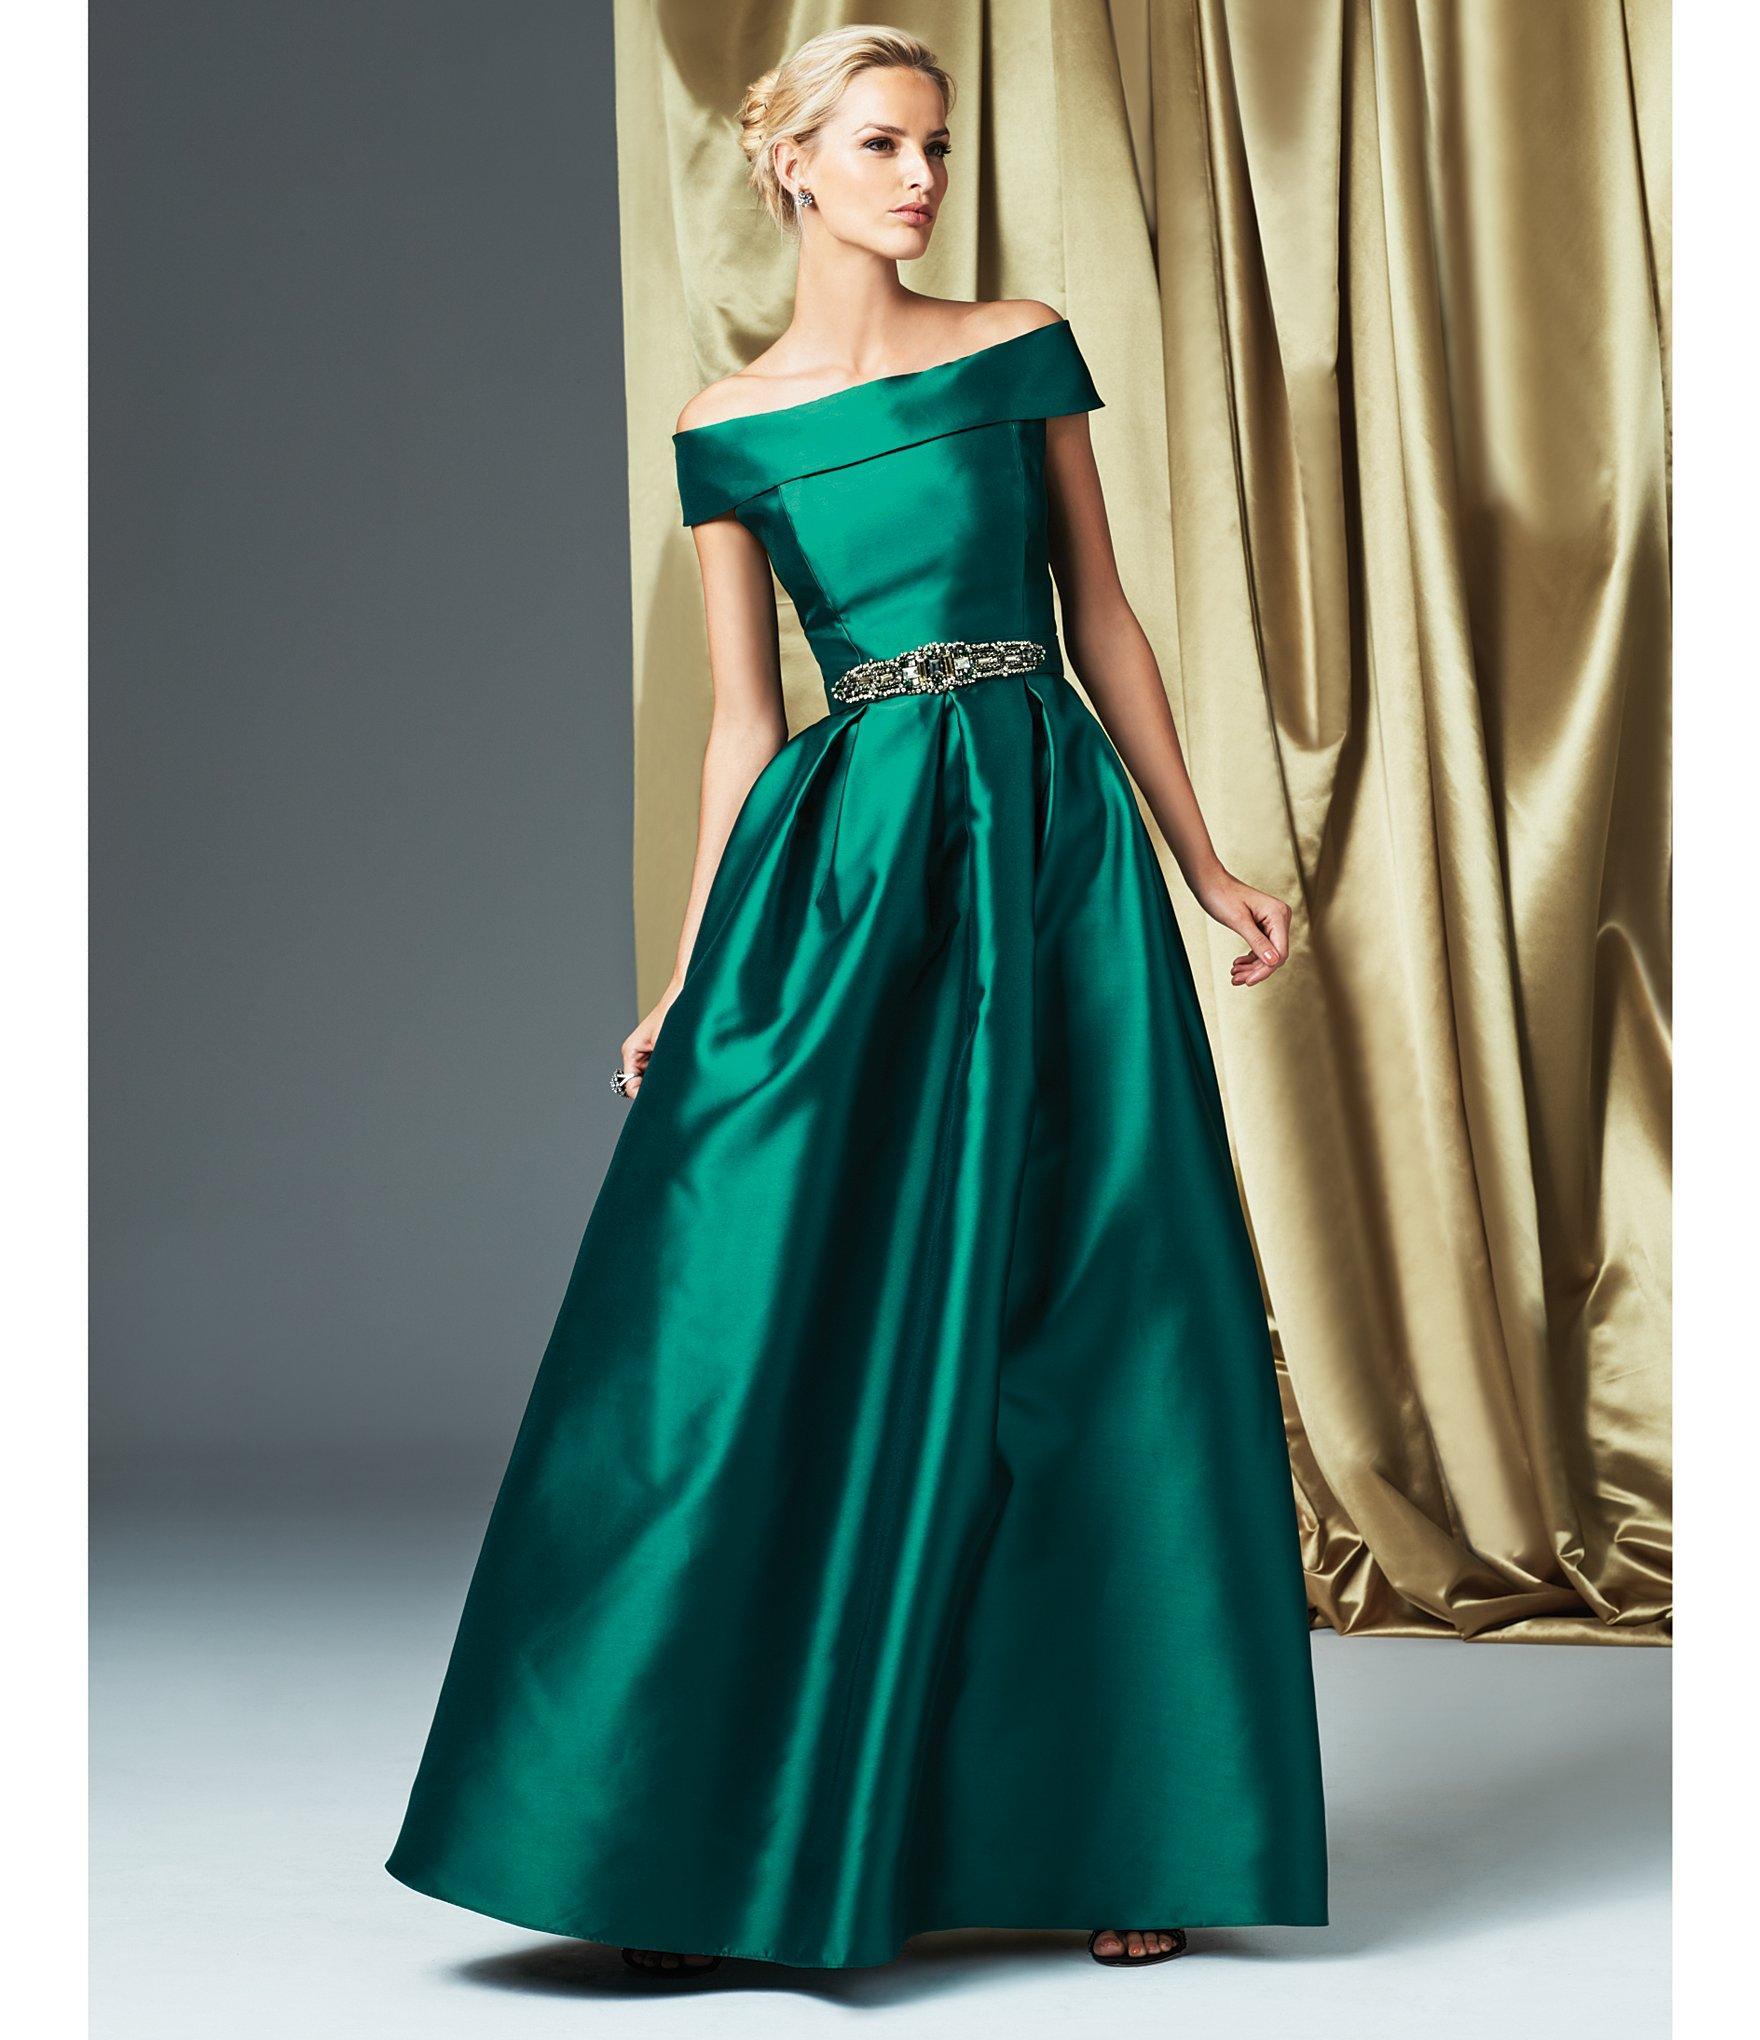 Lyst - Eliza J Off-the-shoulder Short Sleeve Taffeta Ball Gown in Green